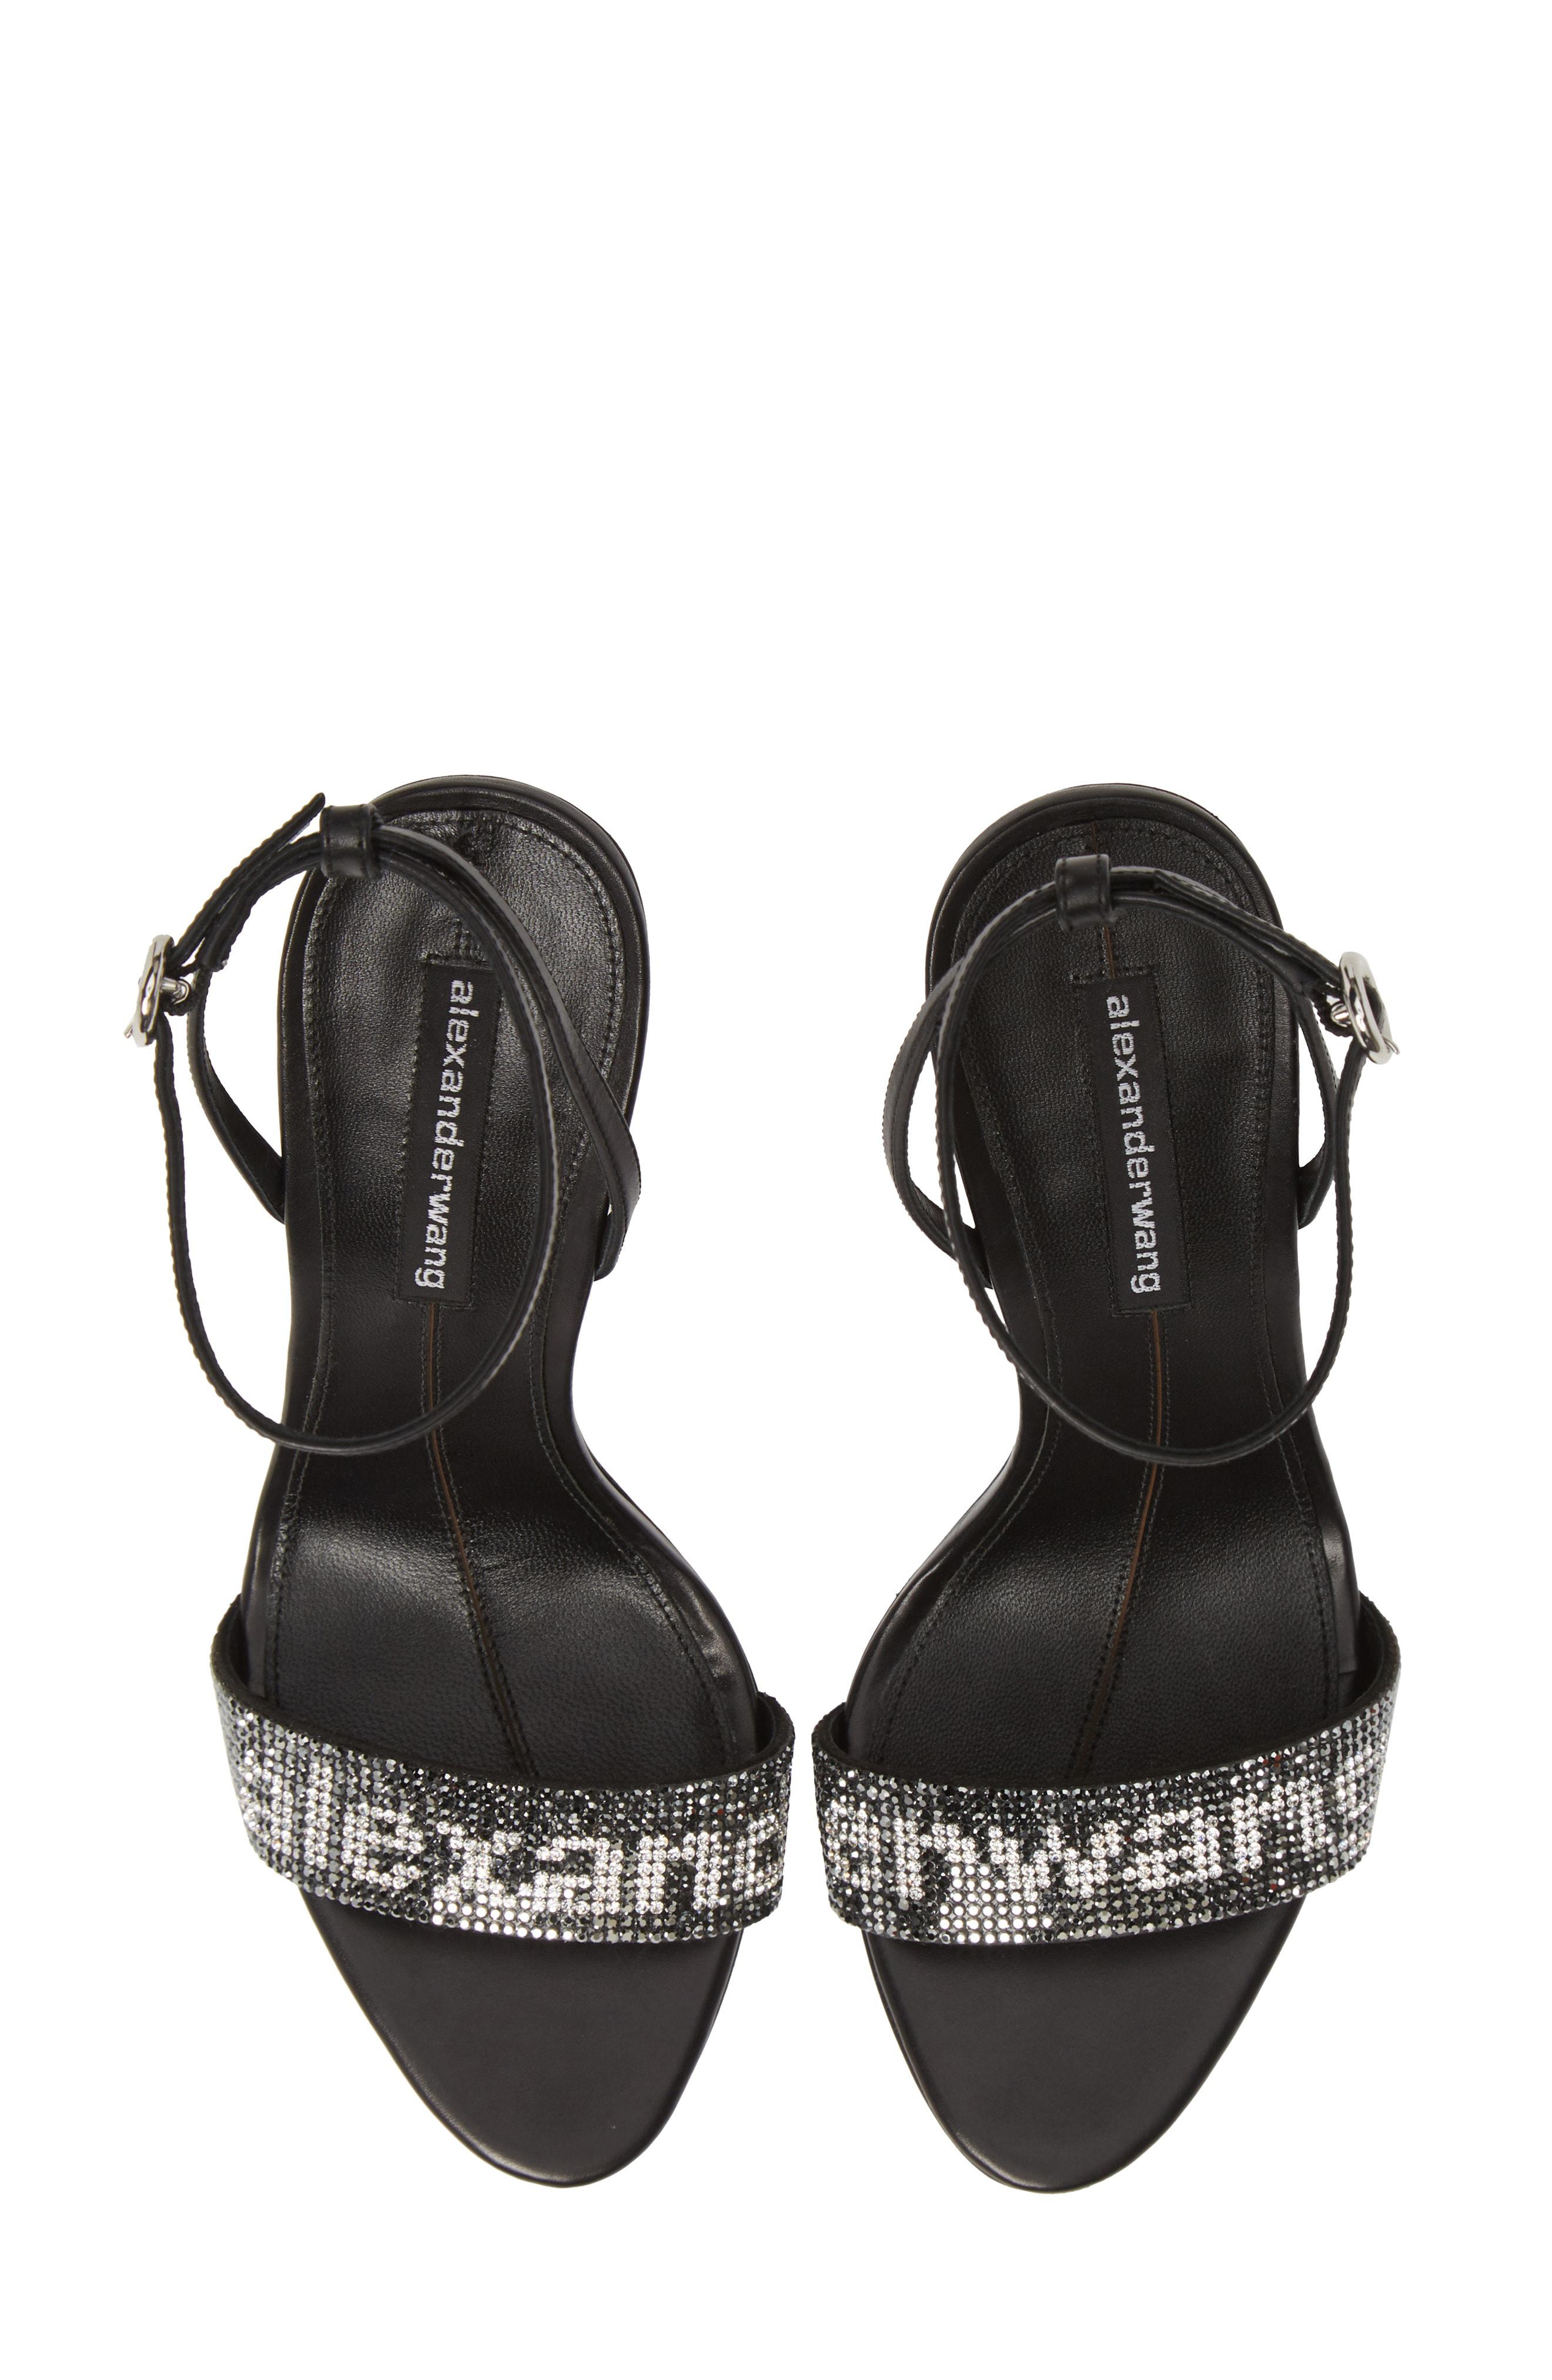 Alexander Wang Jo Crystal Logo Slide Sandals In Black/ Silver